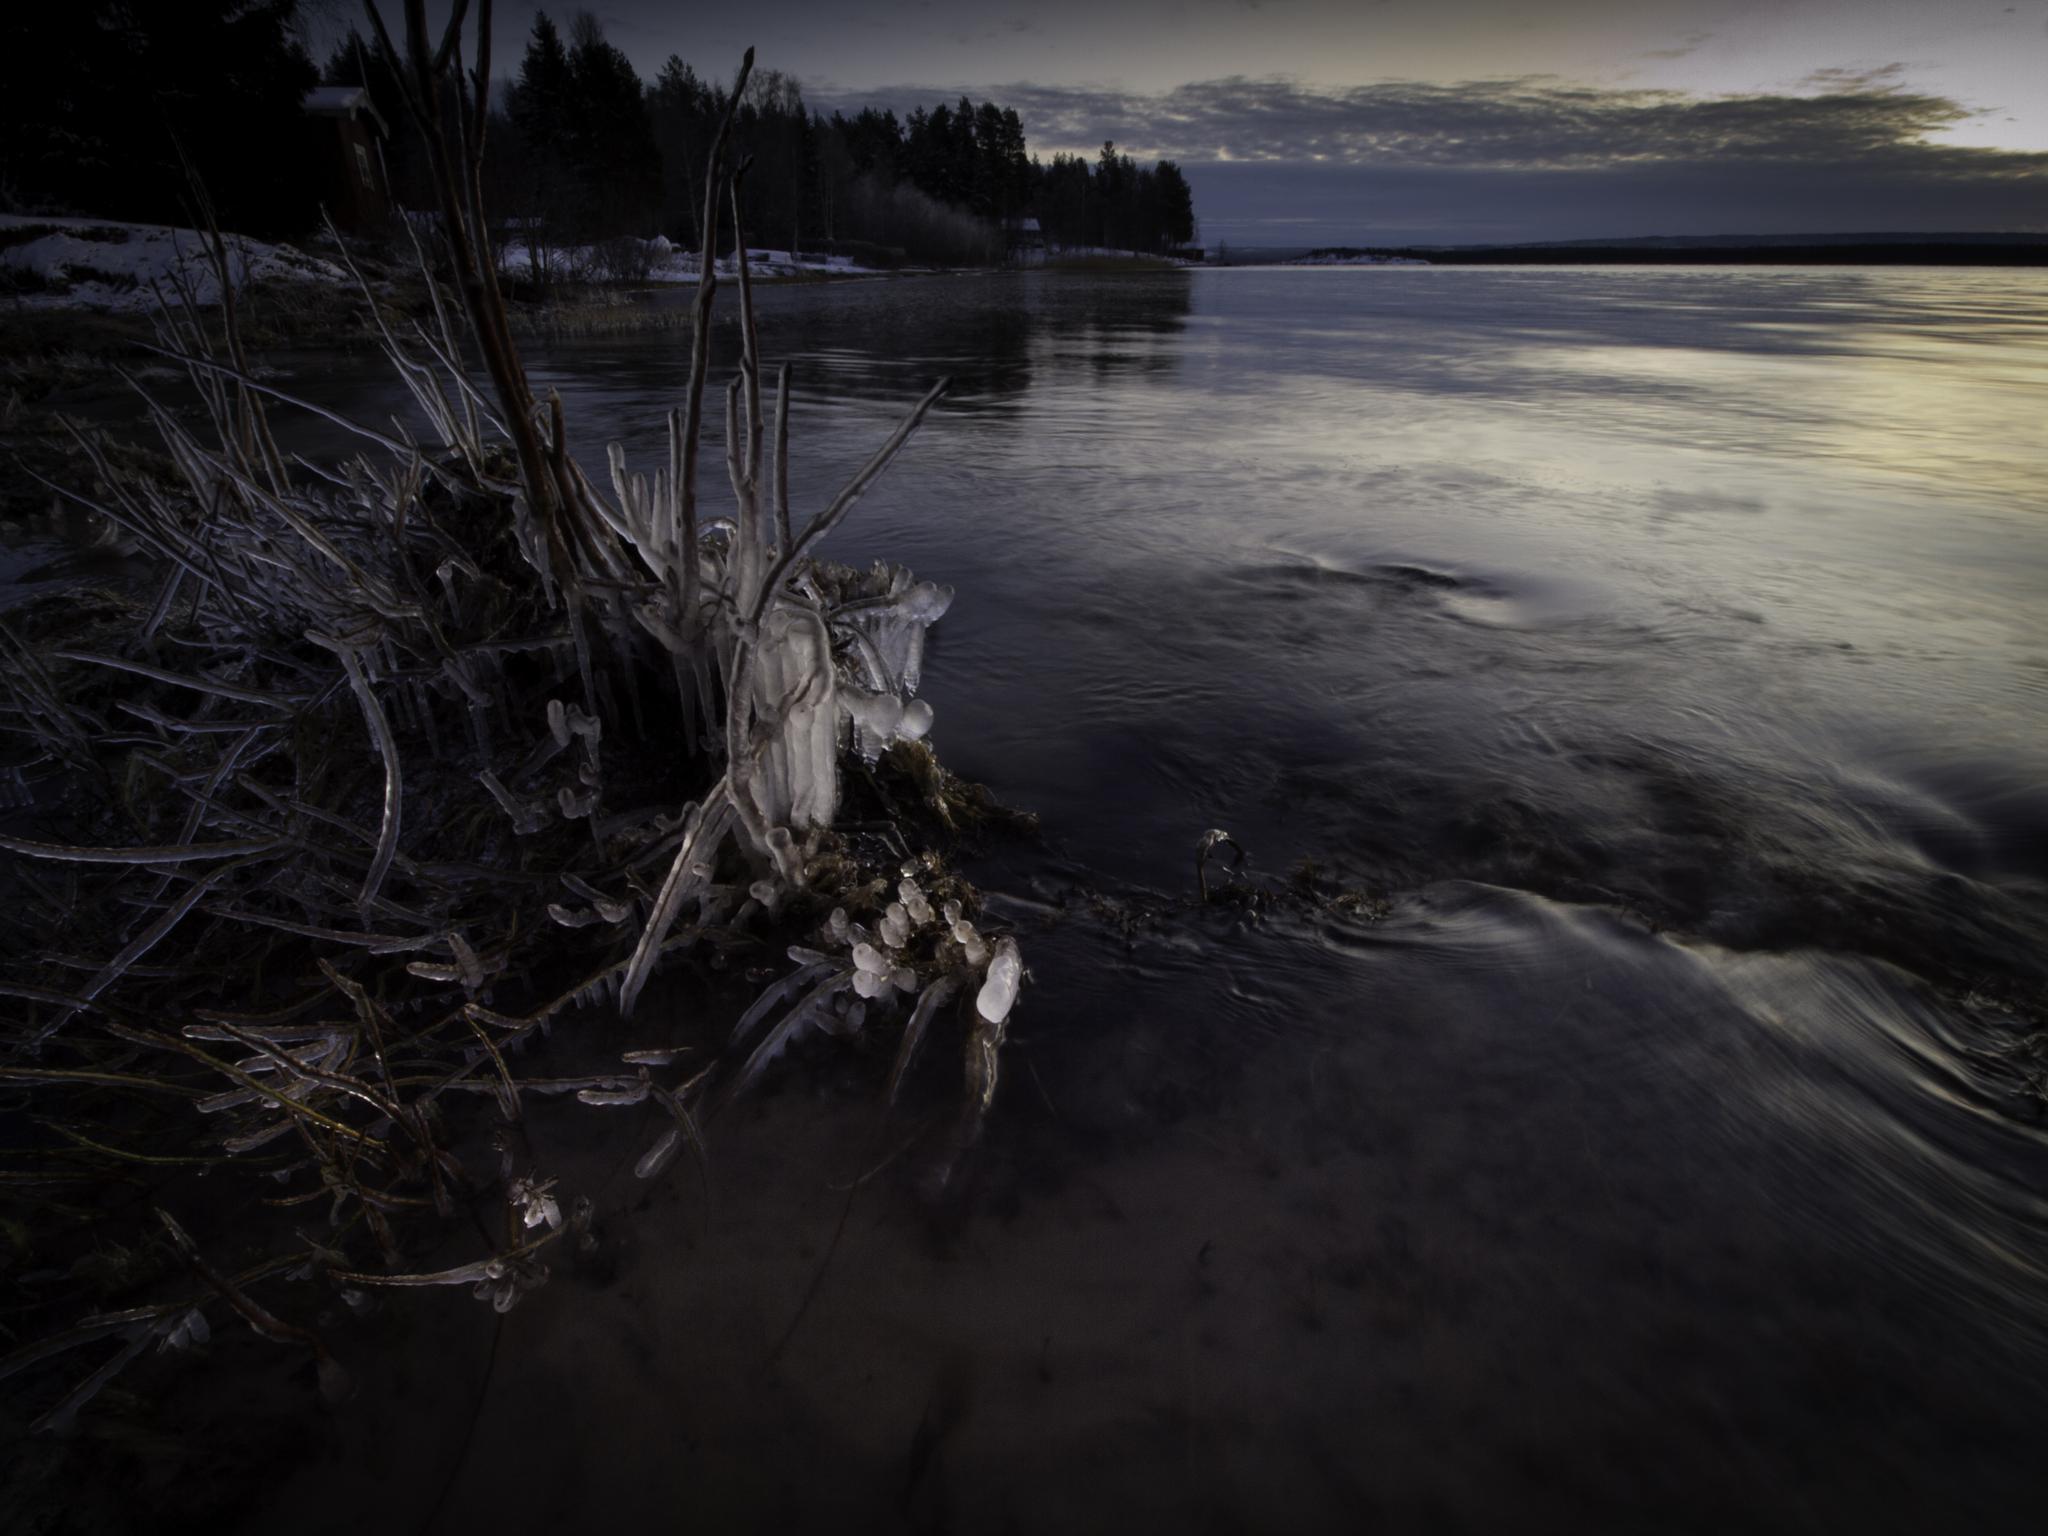 Shore by olof.rosenius